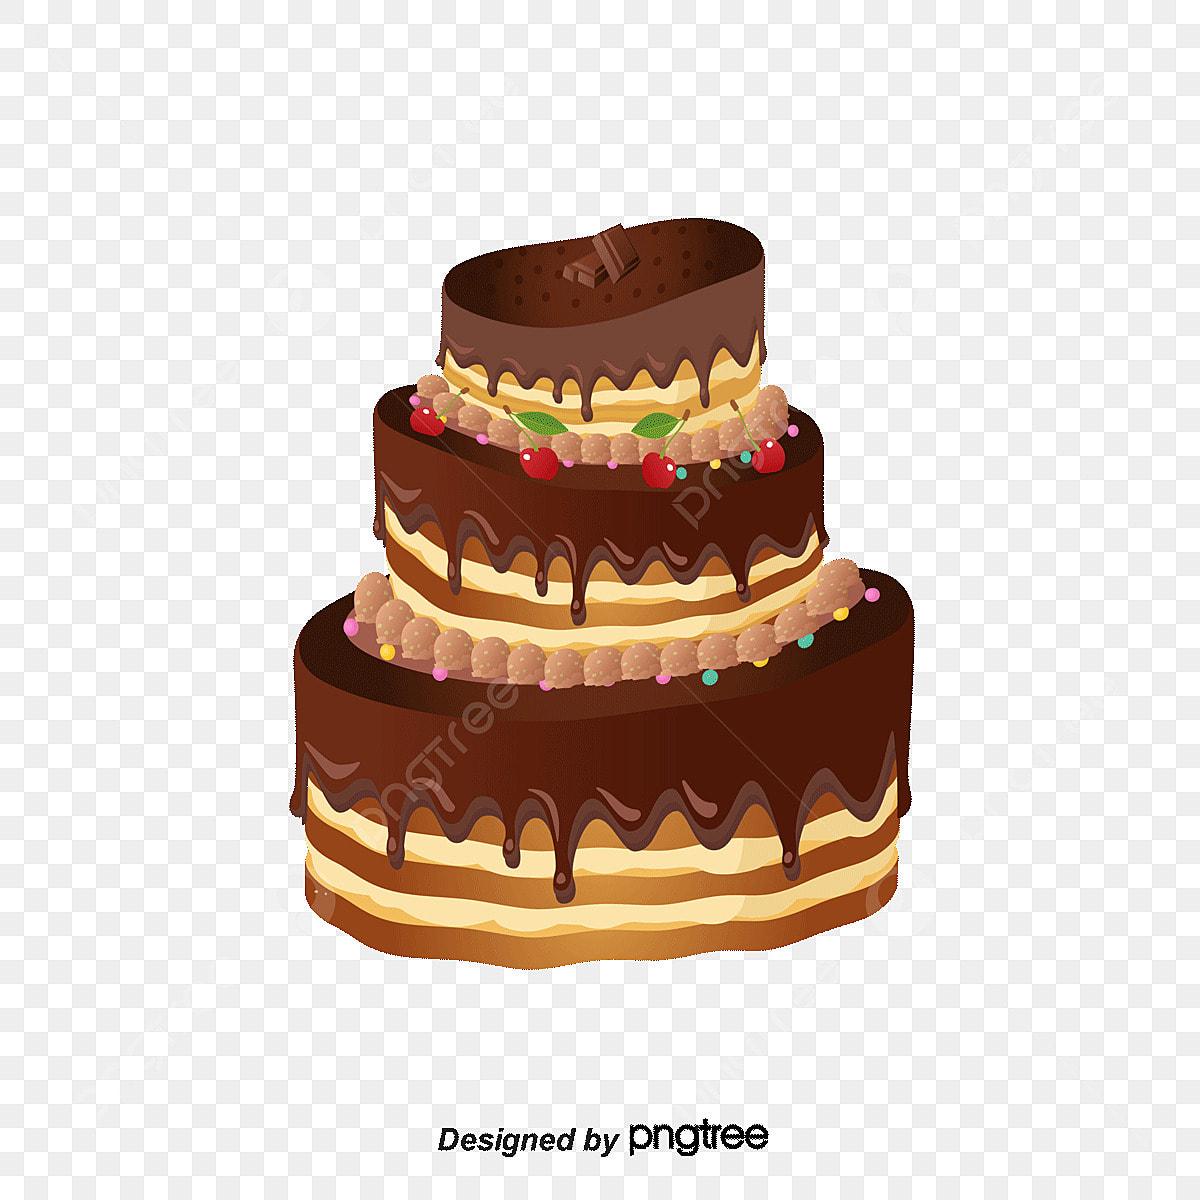 Chocolate Birthday Cake Vector Material, Chocolate Vector, Birthday